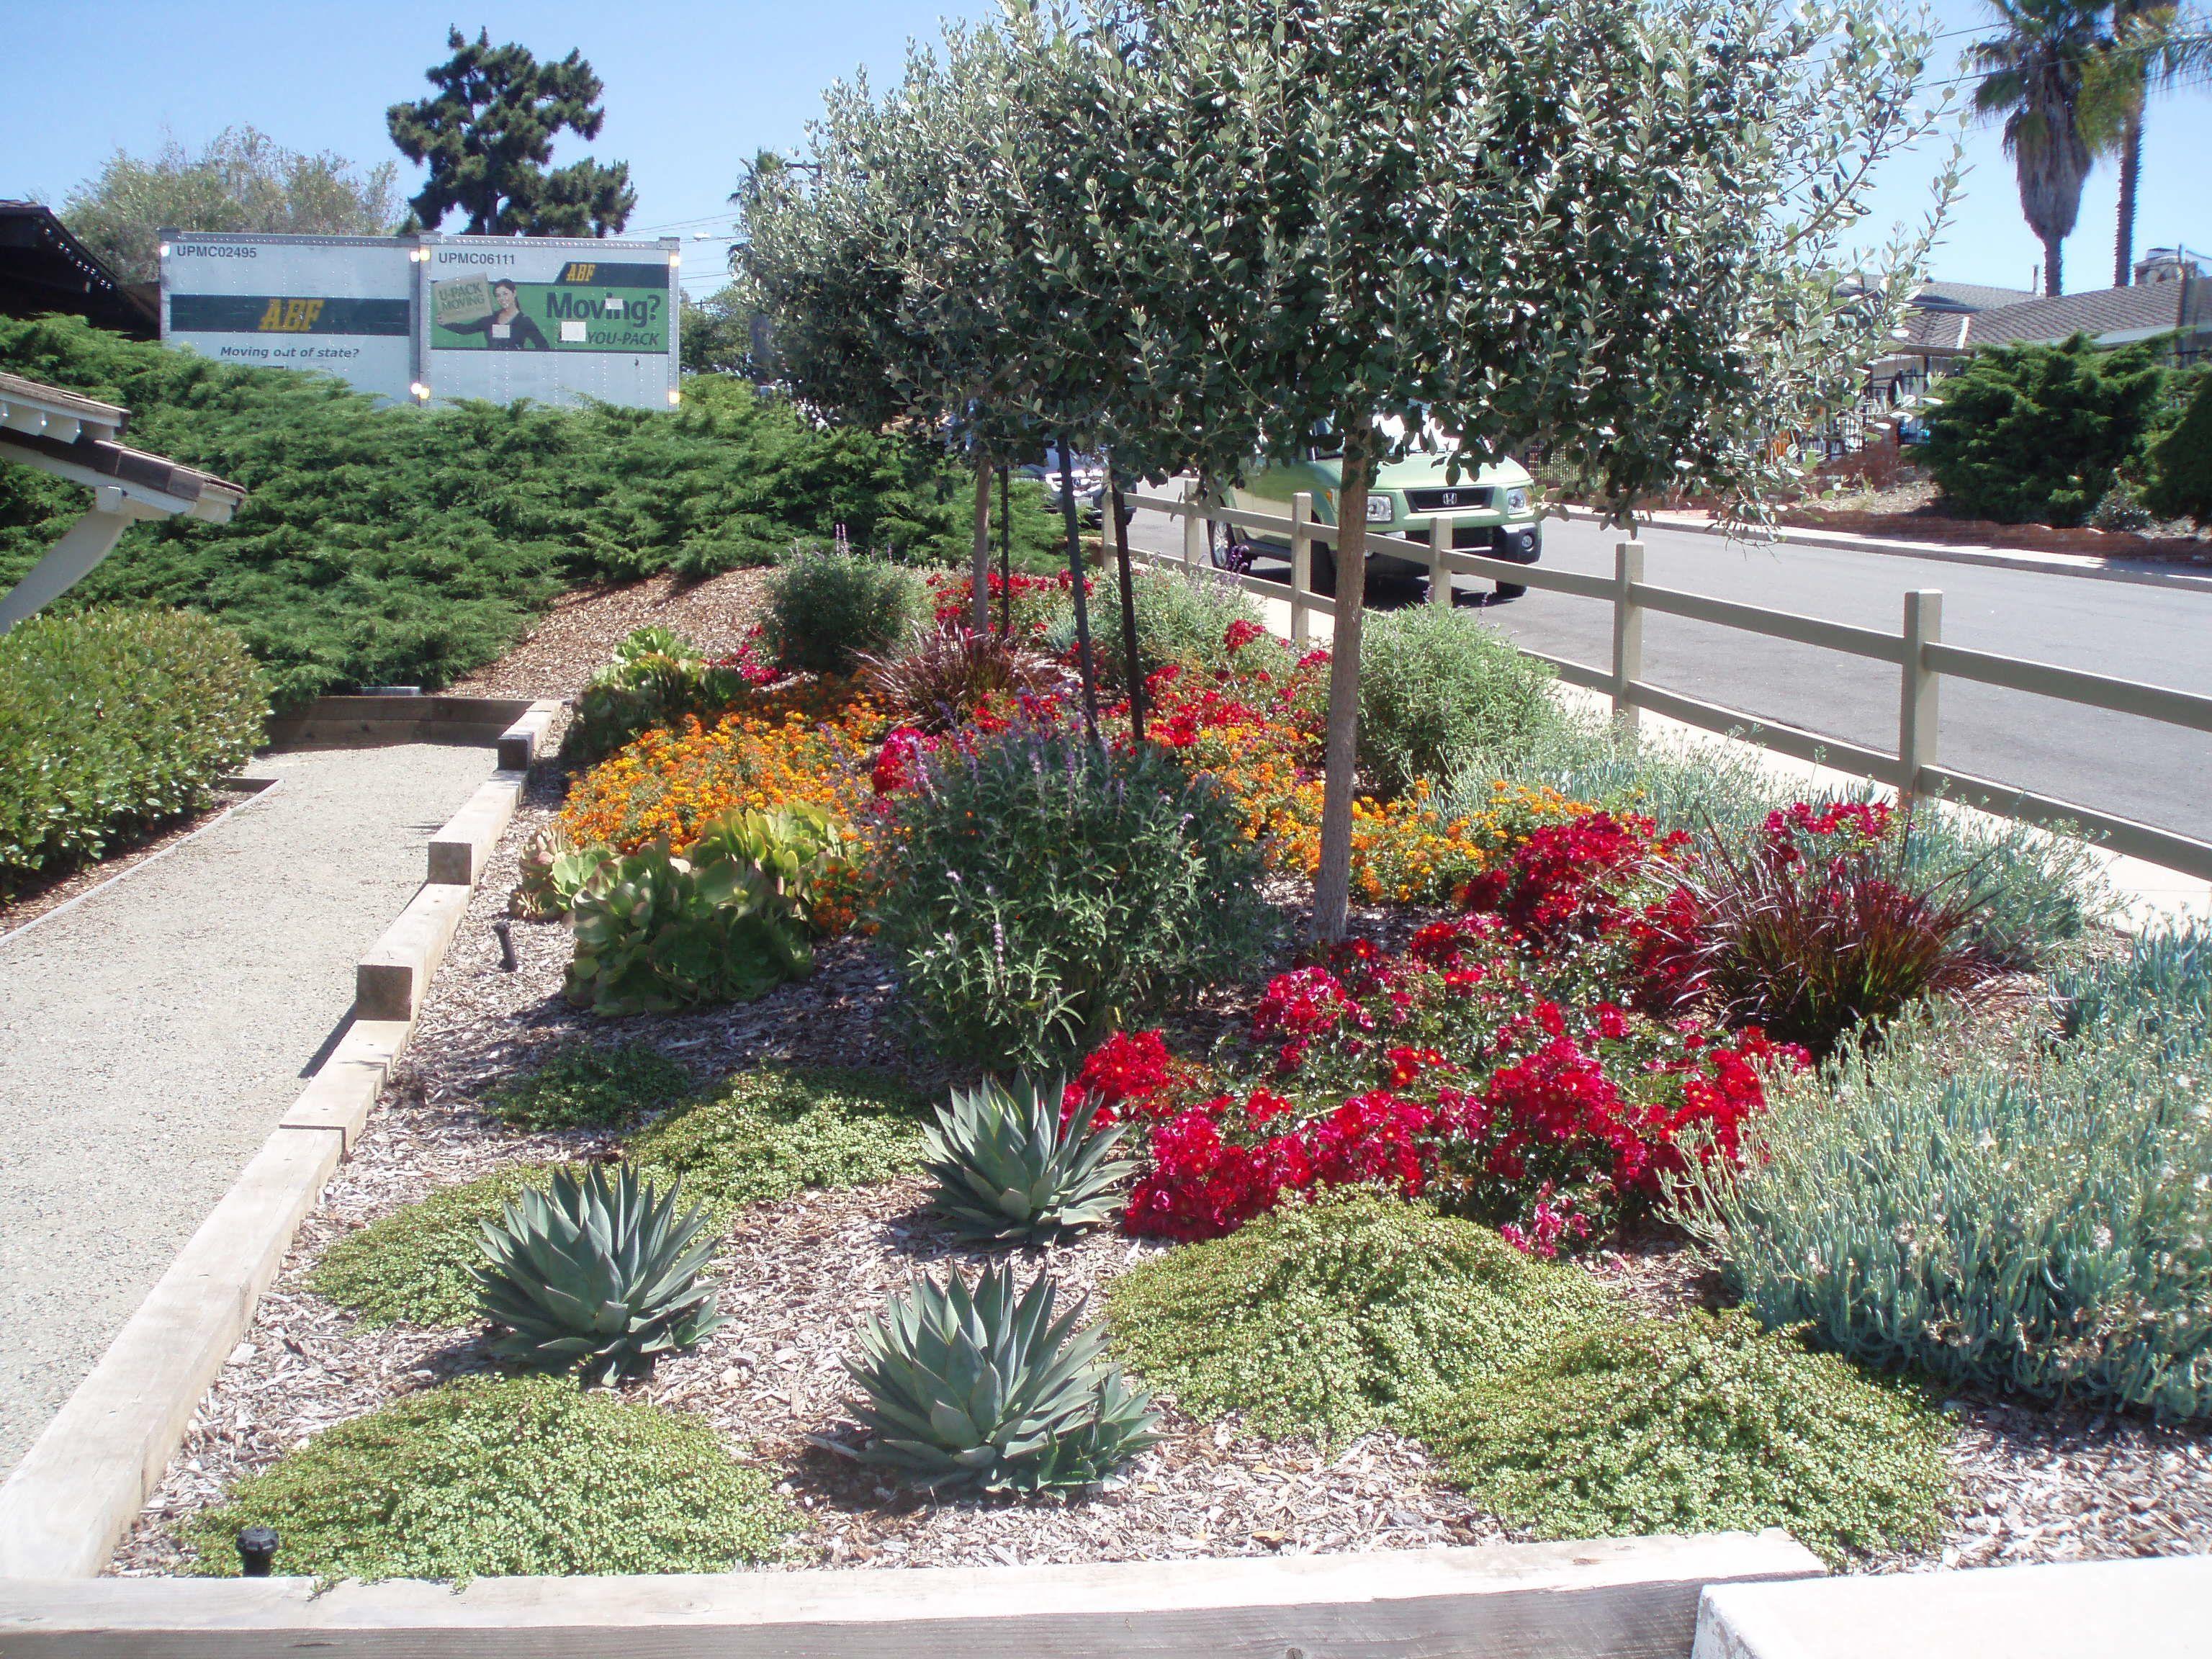 landscape designer susan rojas from waterwise botanicals designed